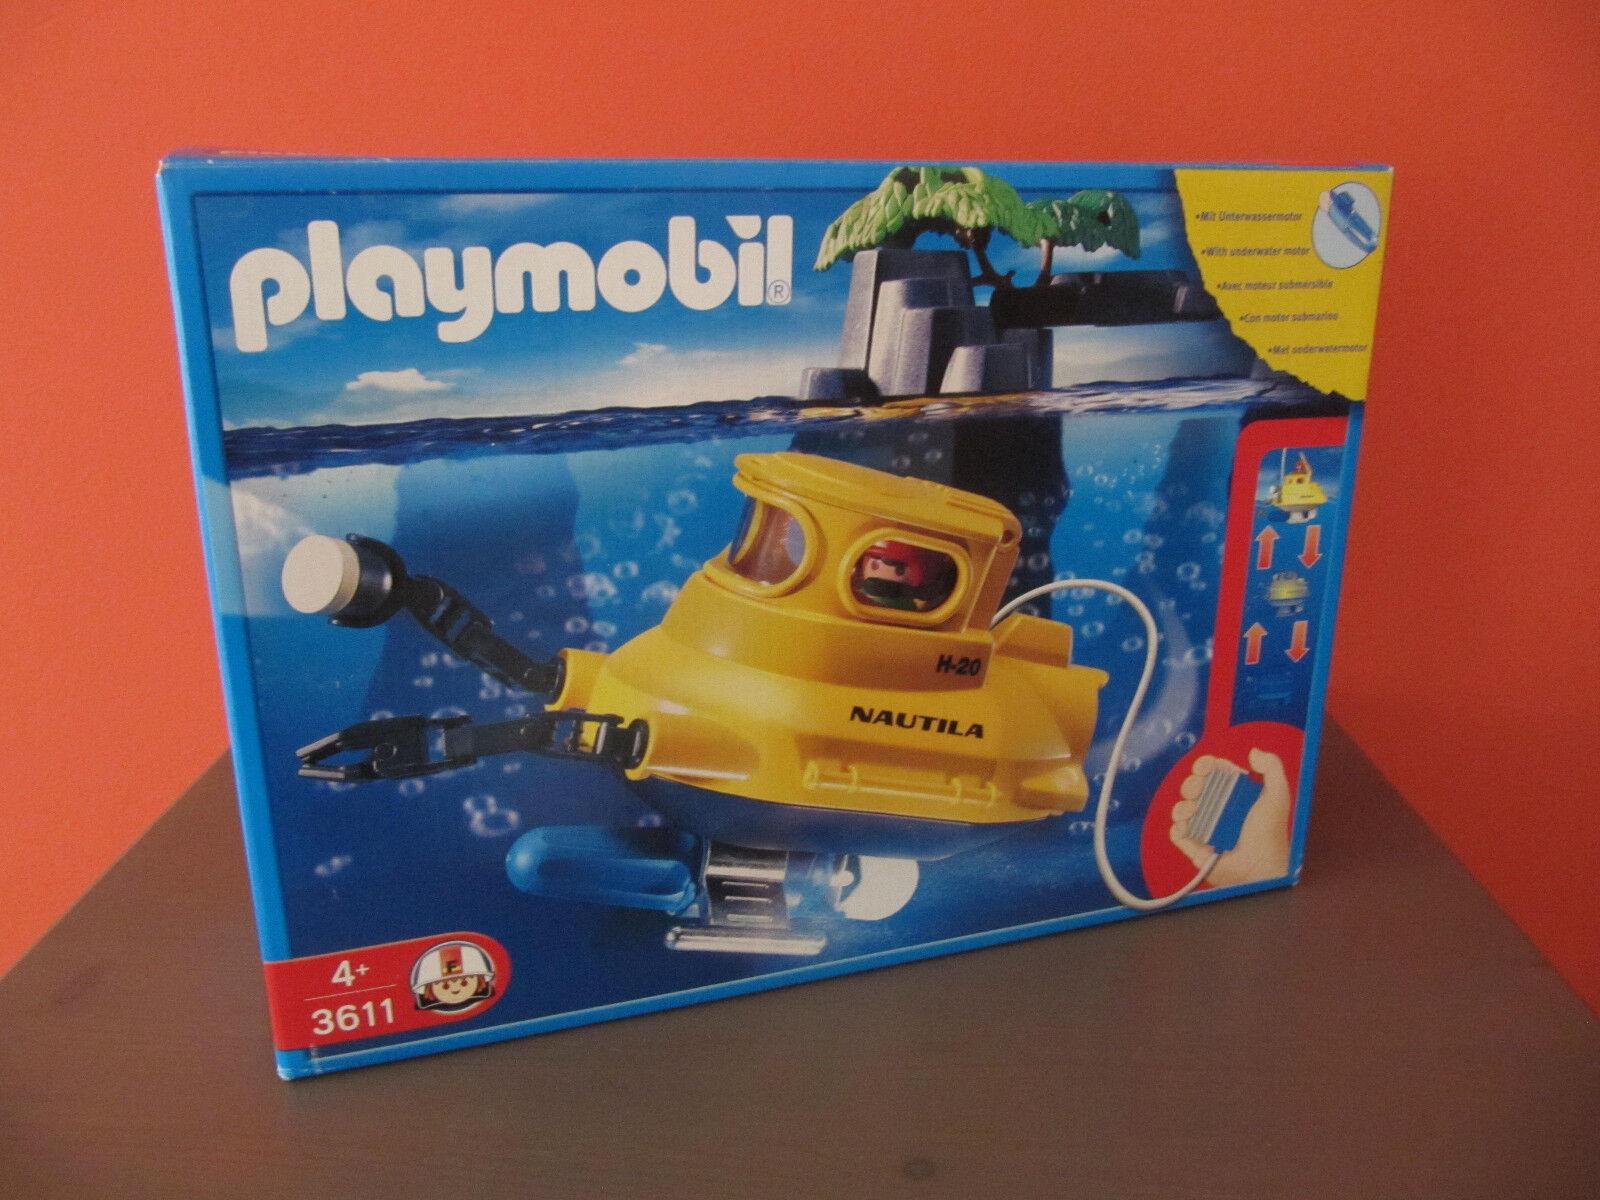 Neu  Playmobil 3611 U-Stiefel   NAUTILA   aus 1980 in ungeöffneter OVP MISB MIB